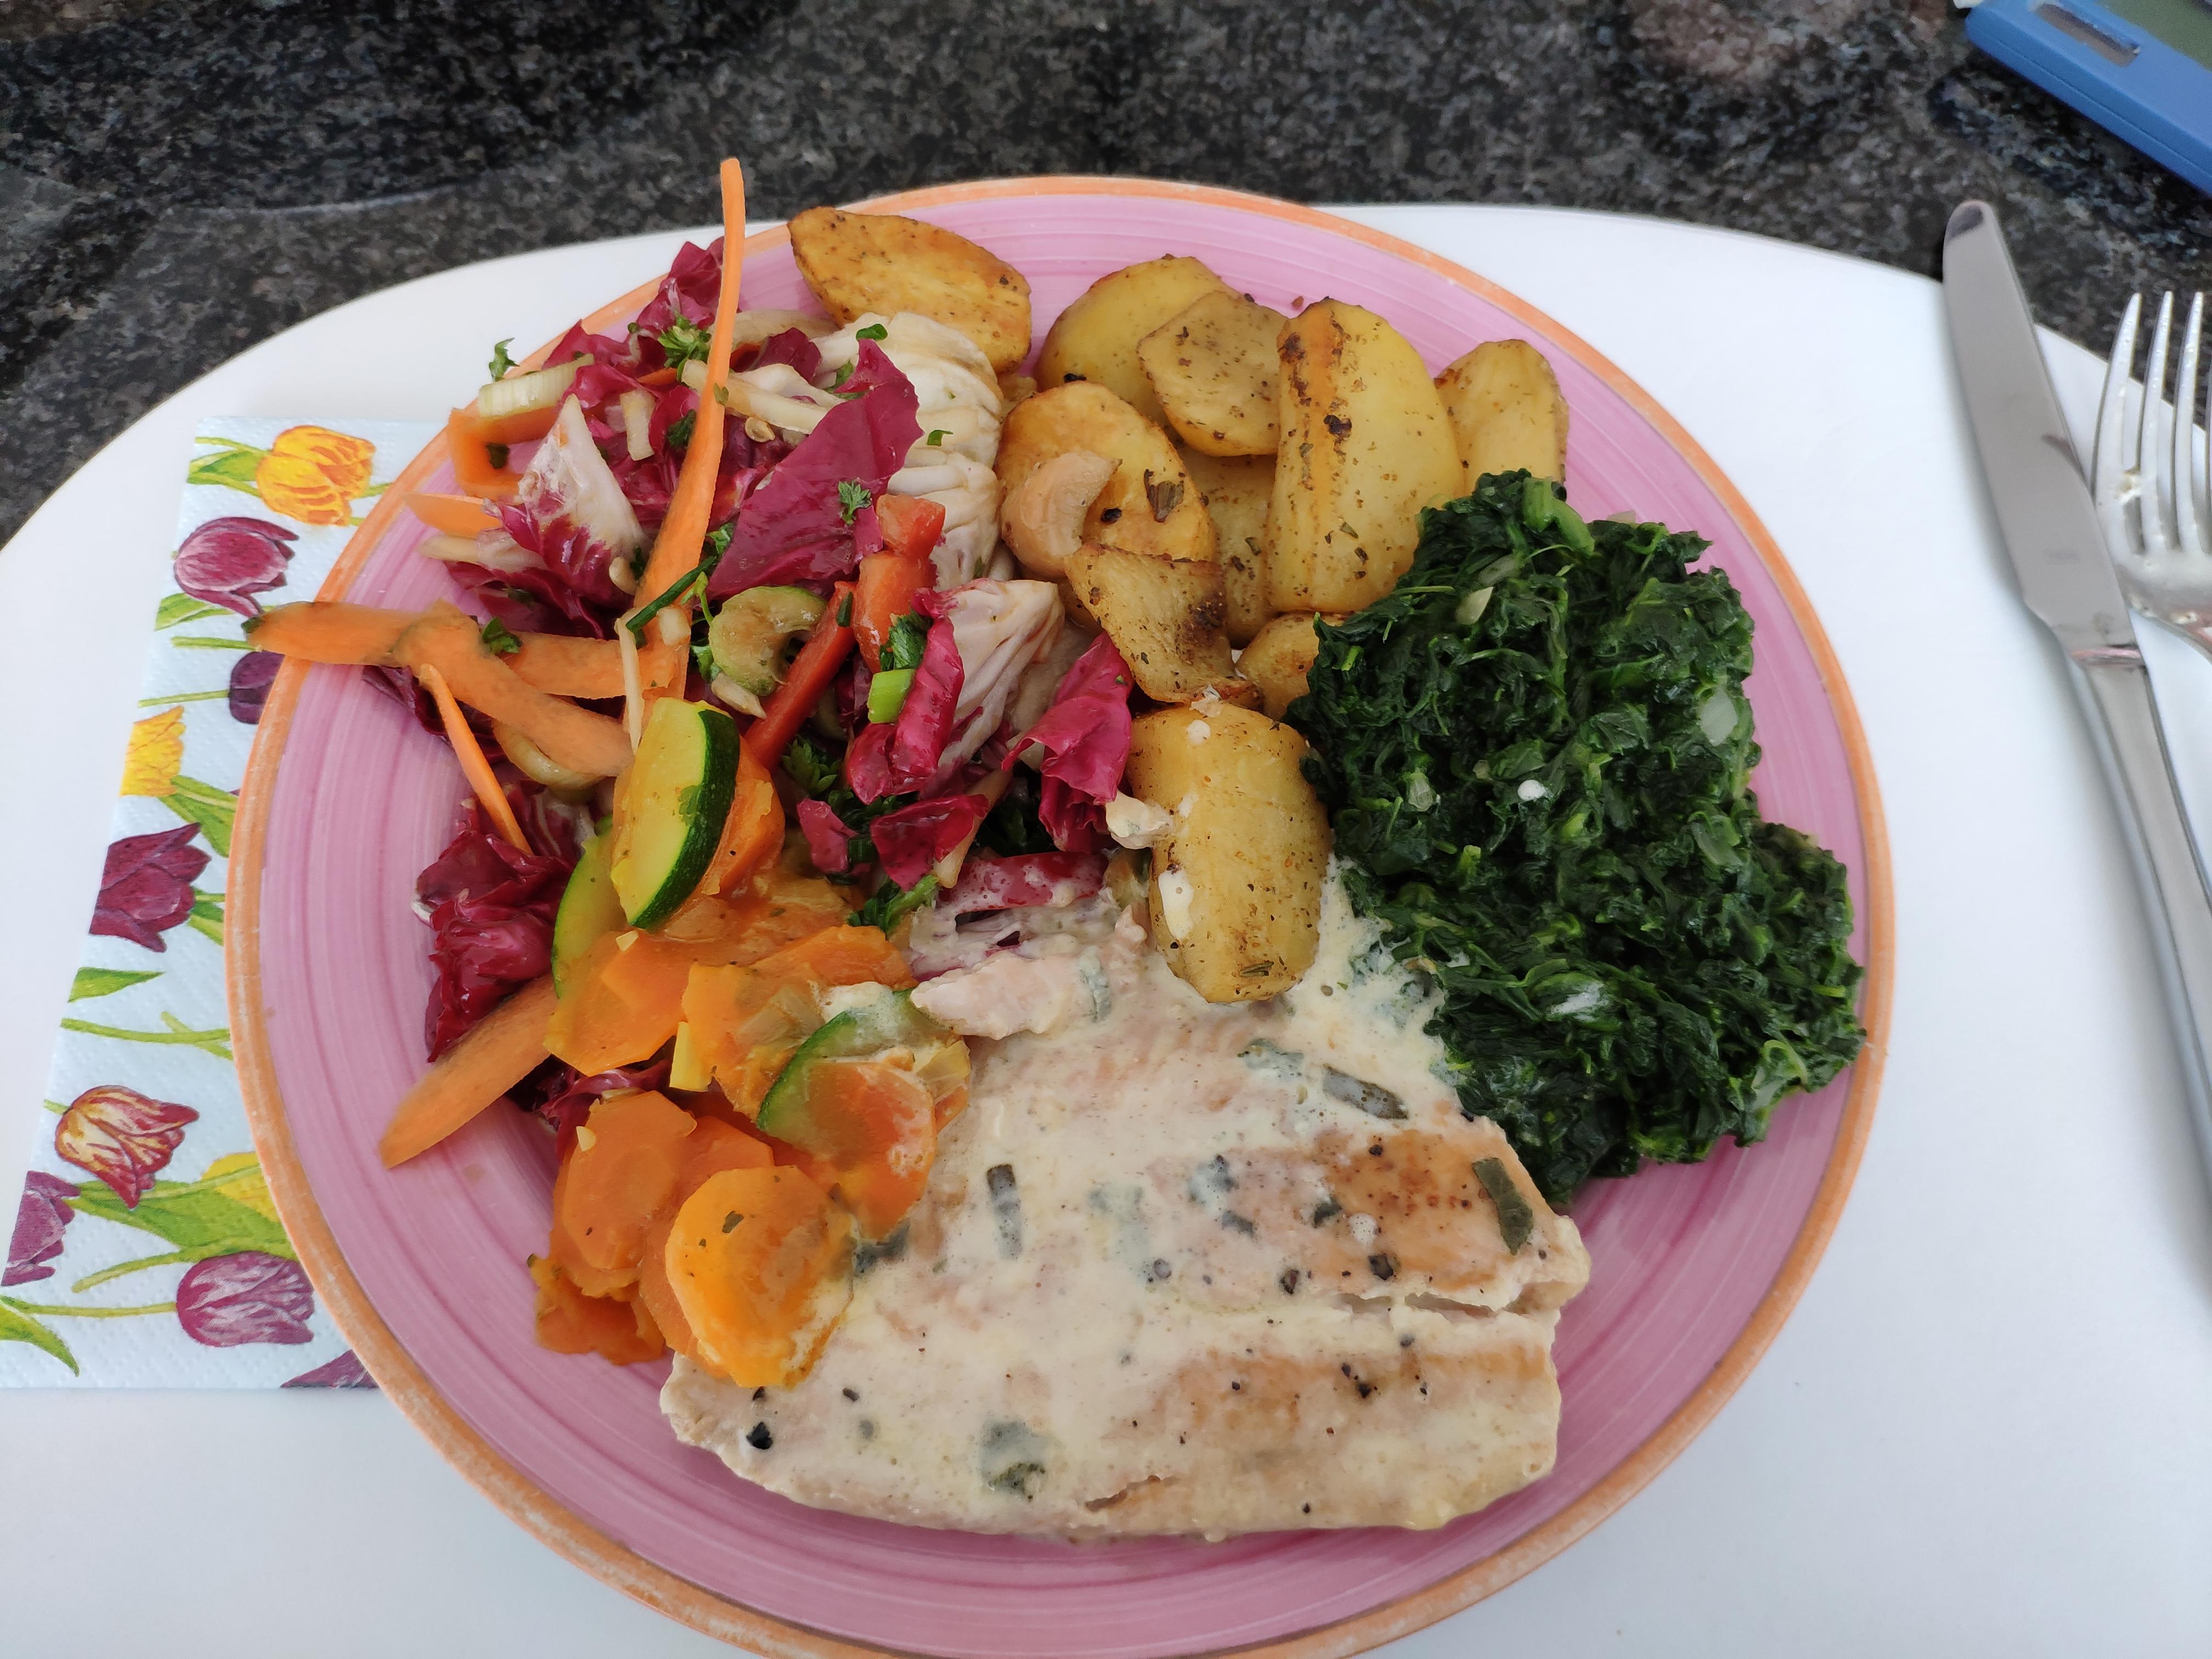 https://foodloader.net/nico_2020-04-19_lachs-spinat-kartoffeln-salat.jpg